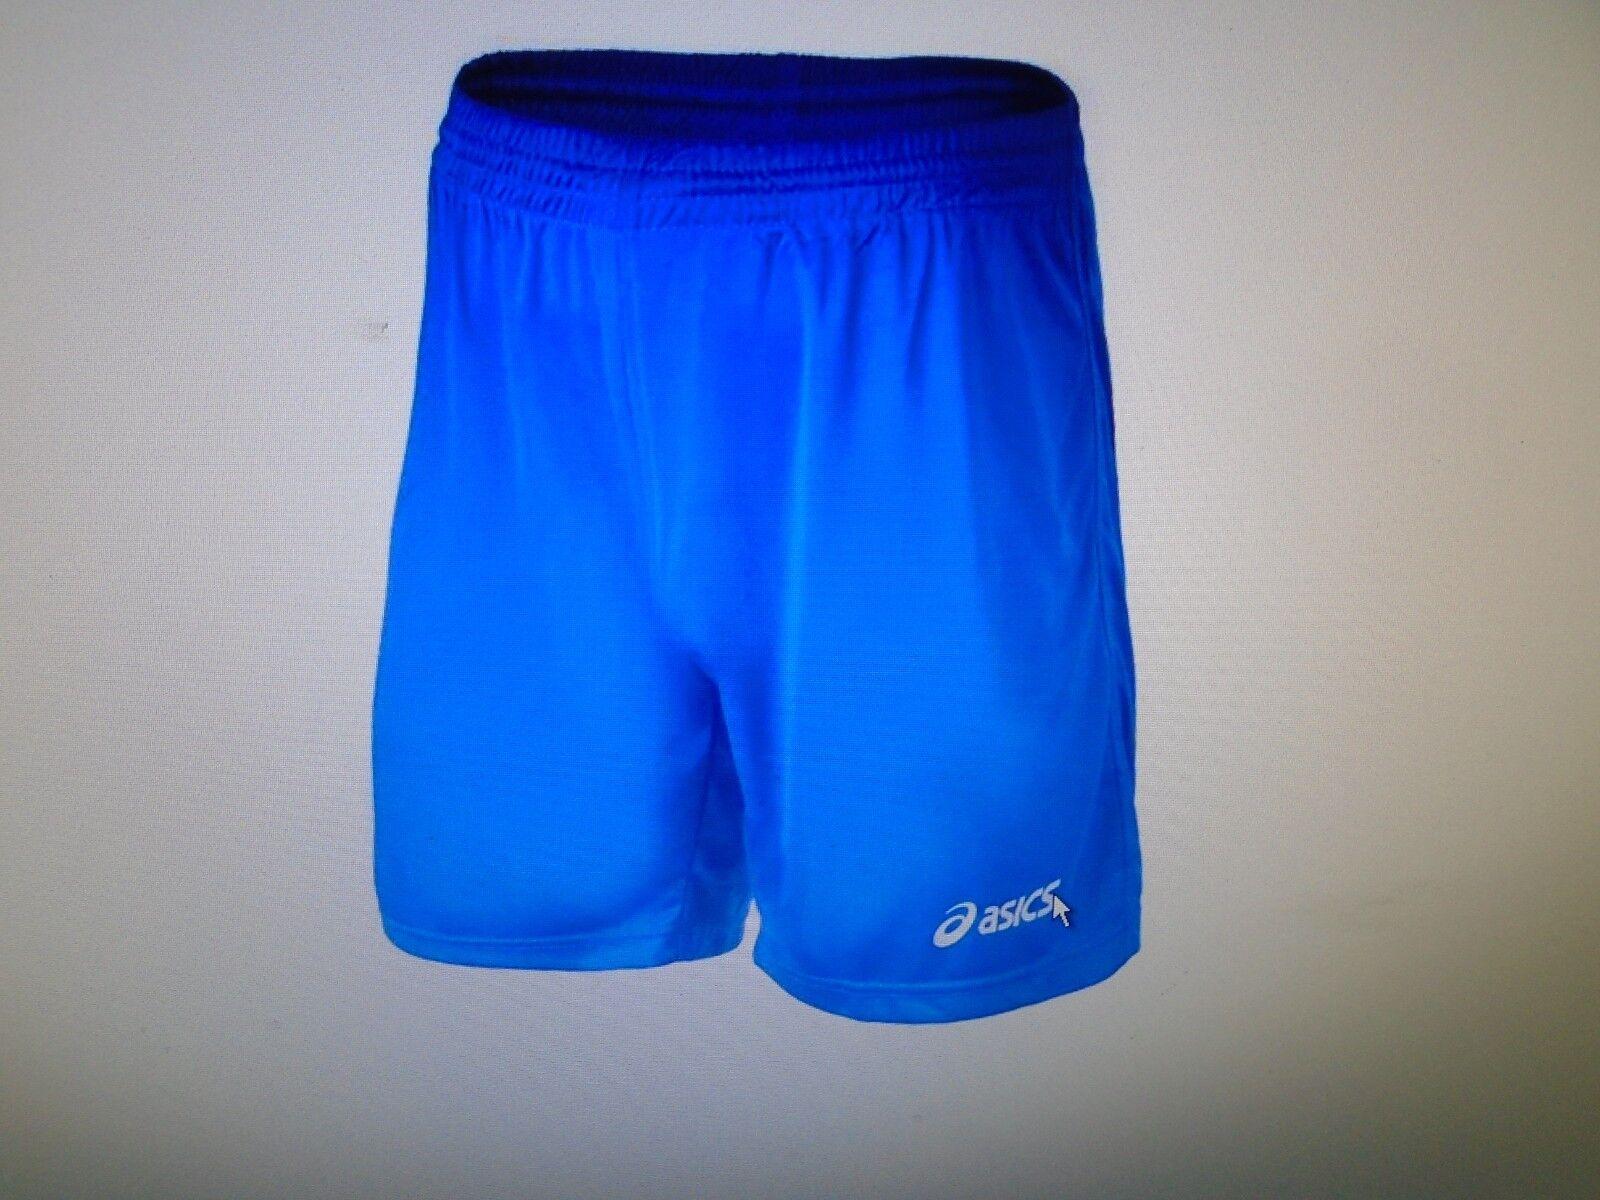 Nouveau ASICS Jogging Jogging Jogging Bermuda Pantalon Court Short Bleu SPORT XXL 3xl xxxl fe519b